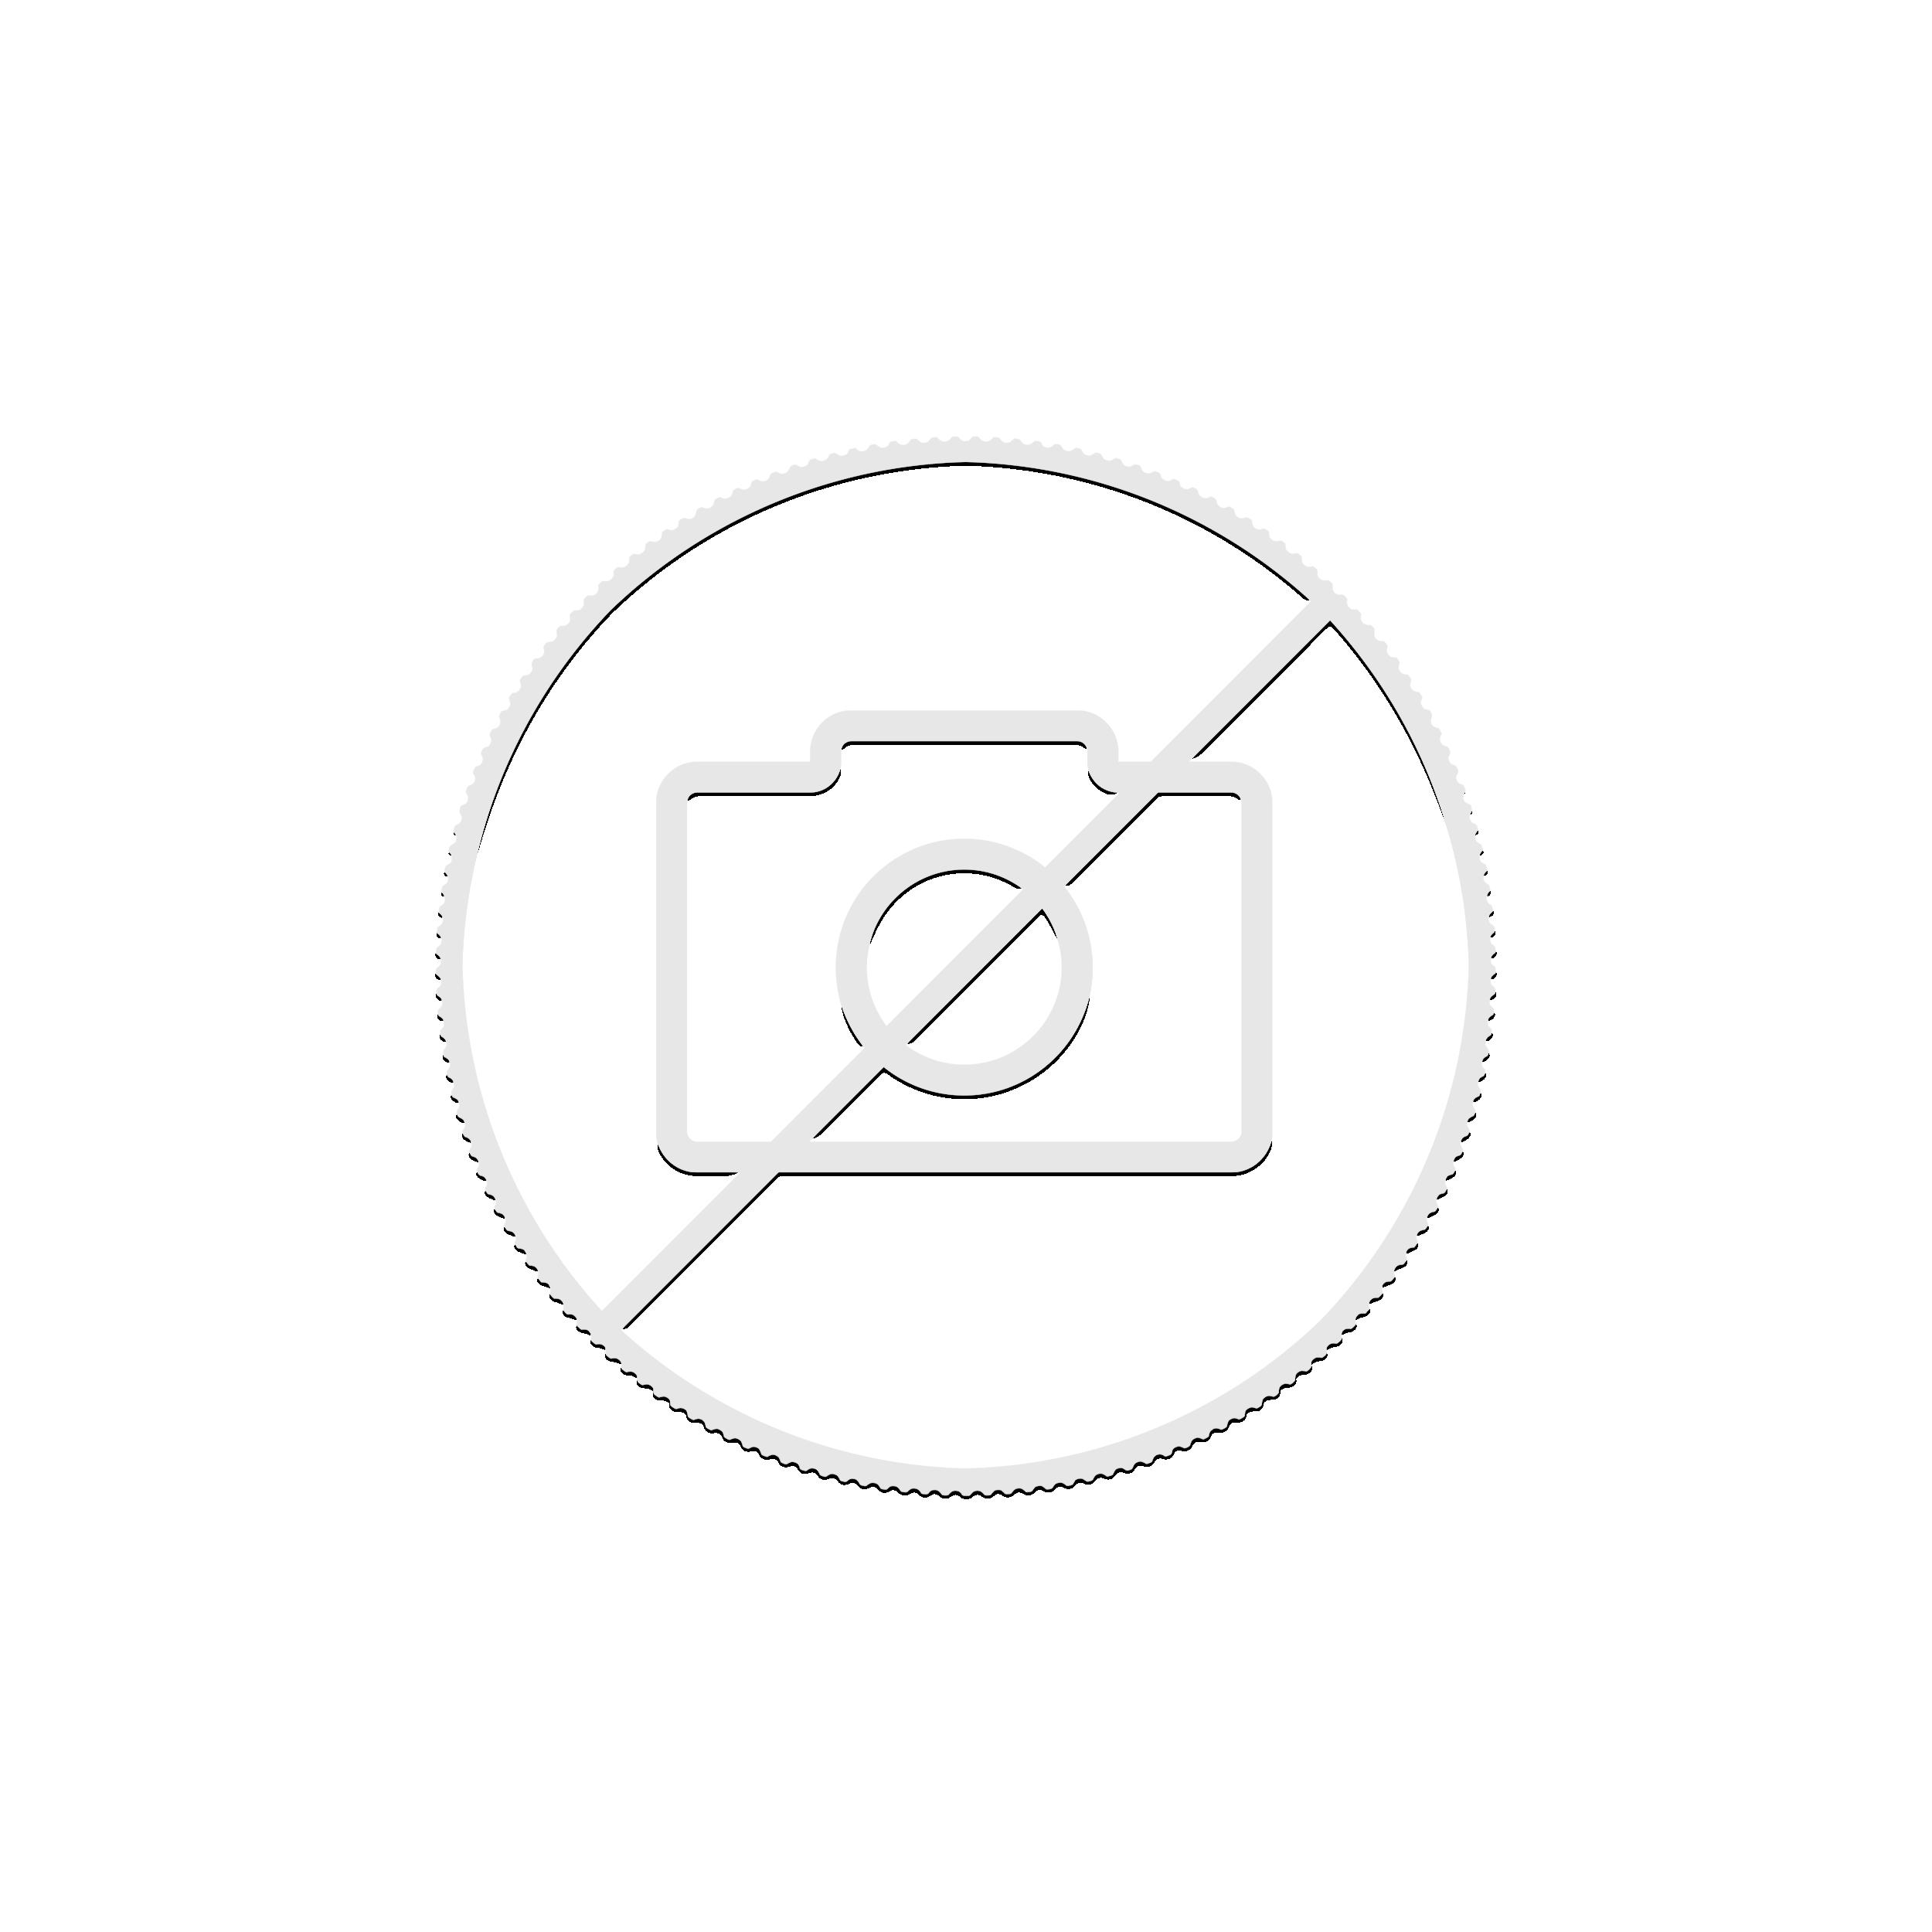 1 Troy ounce zilveren munt Krugerrand 2020